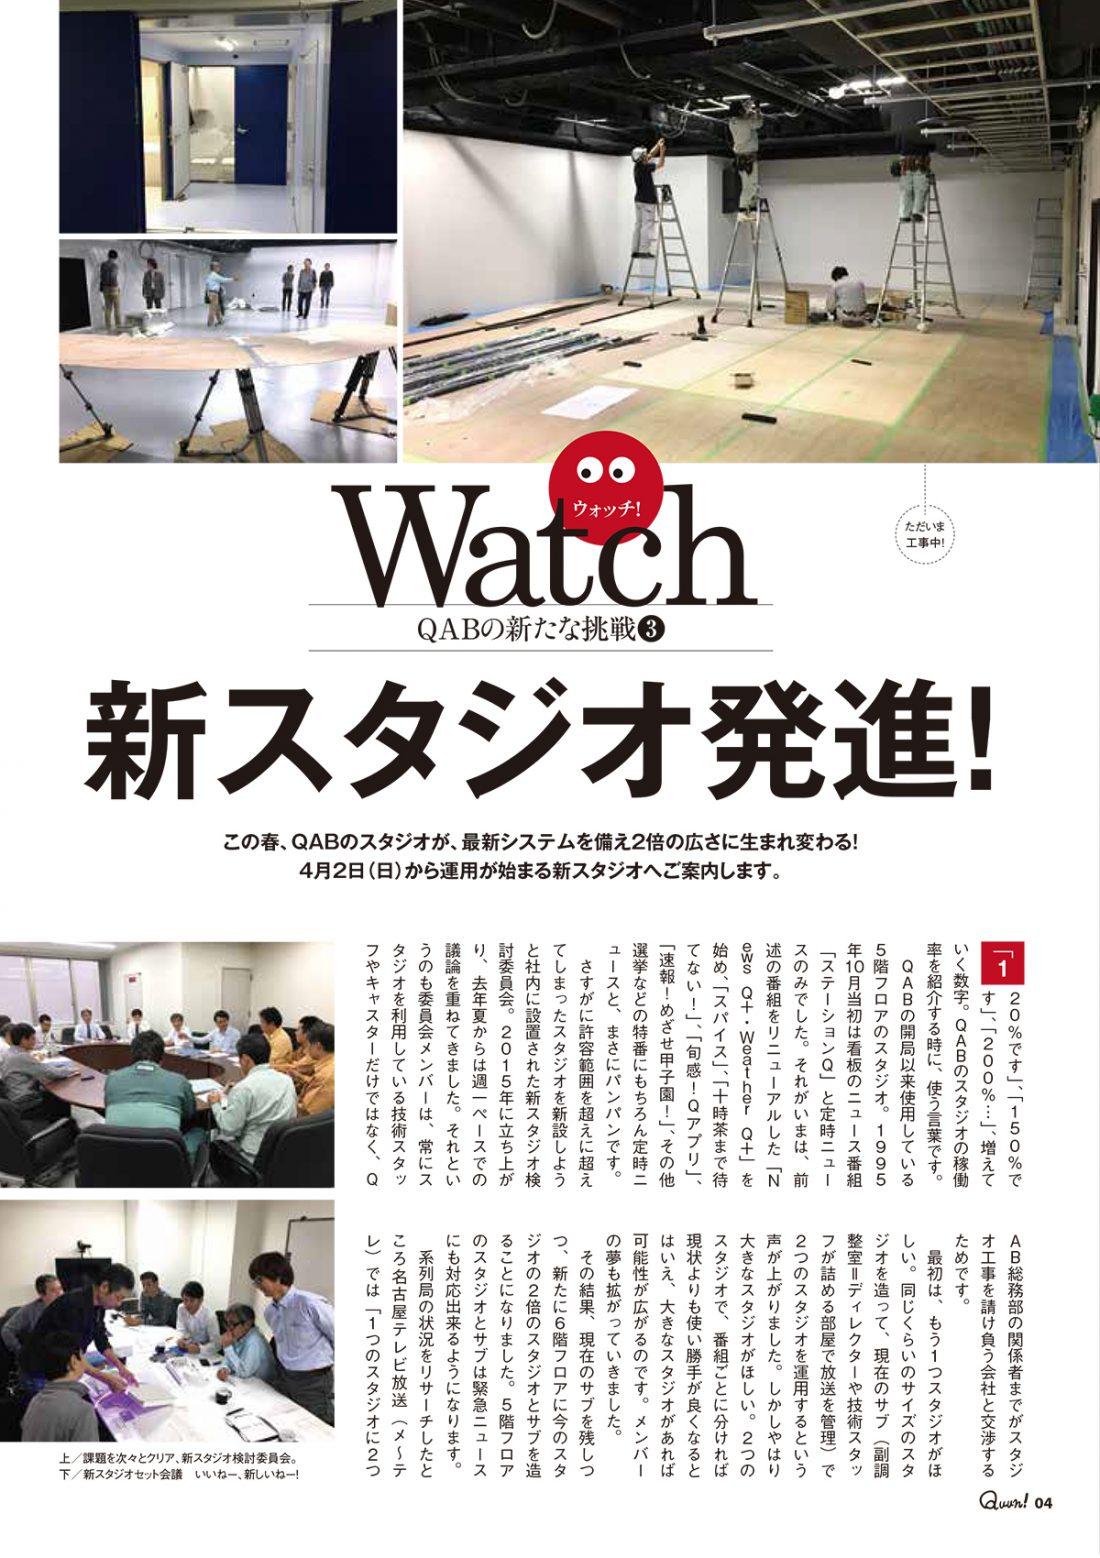 https://www.qab.co.jp/qgoro/wp-content/uploads/quun_0706-1100x1558.jpg